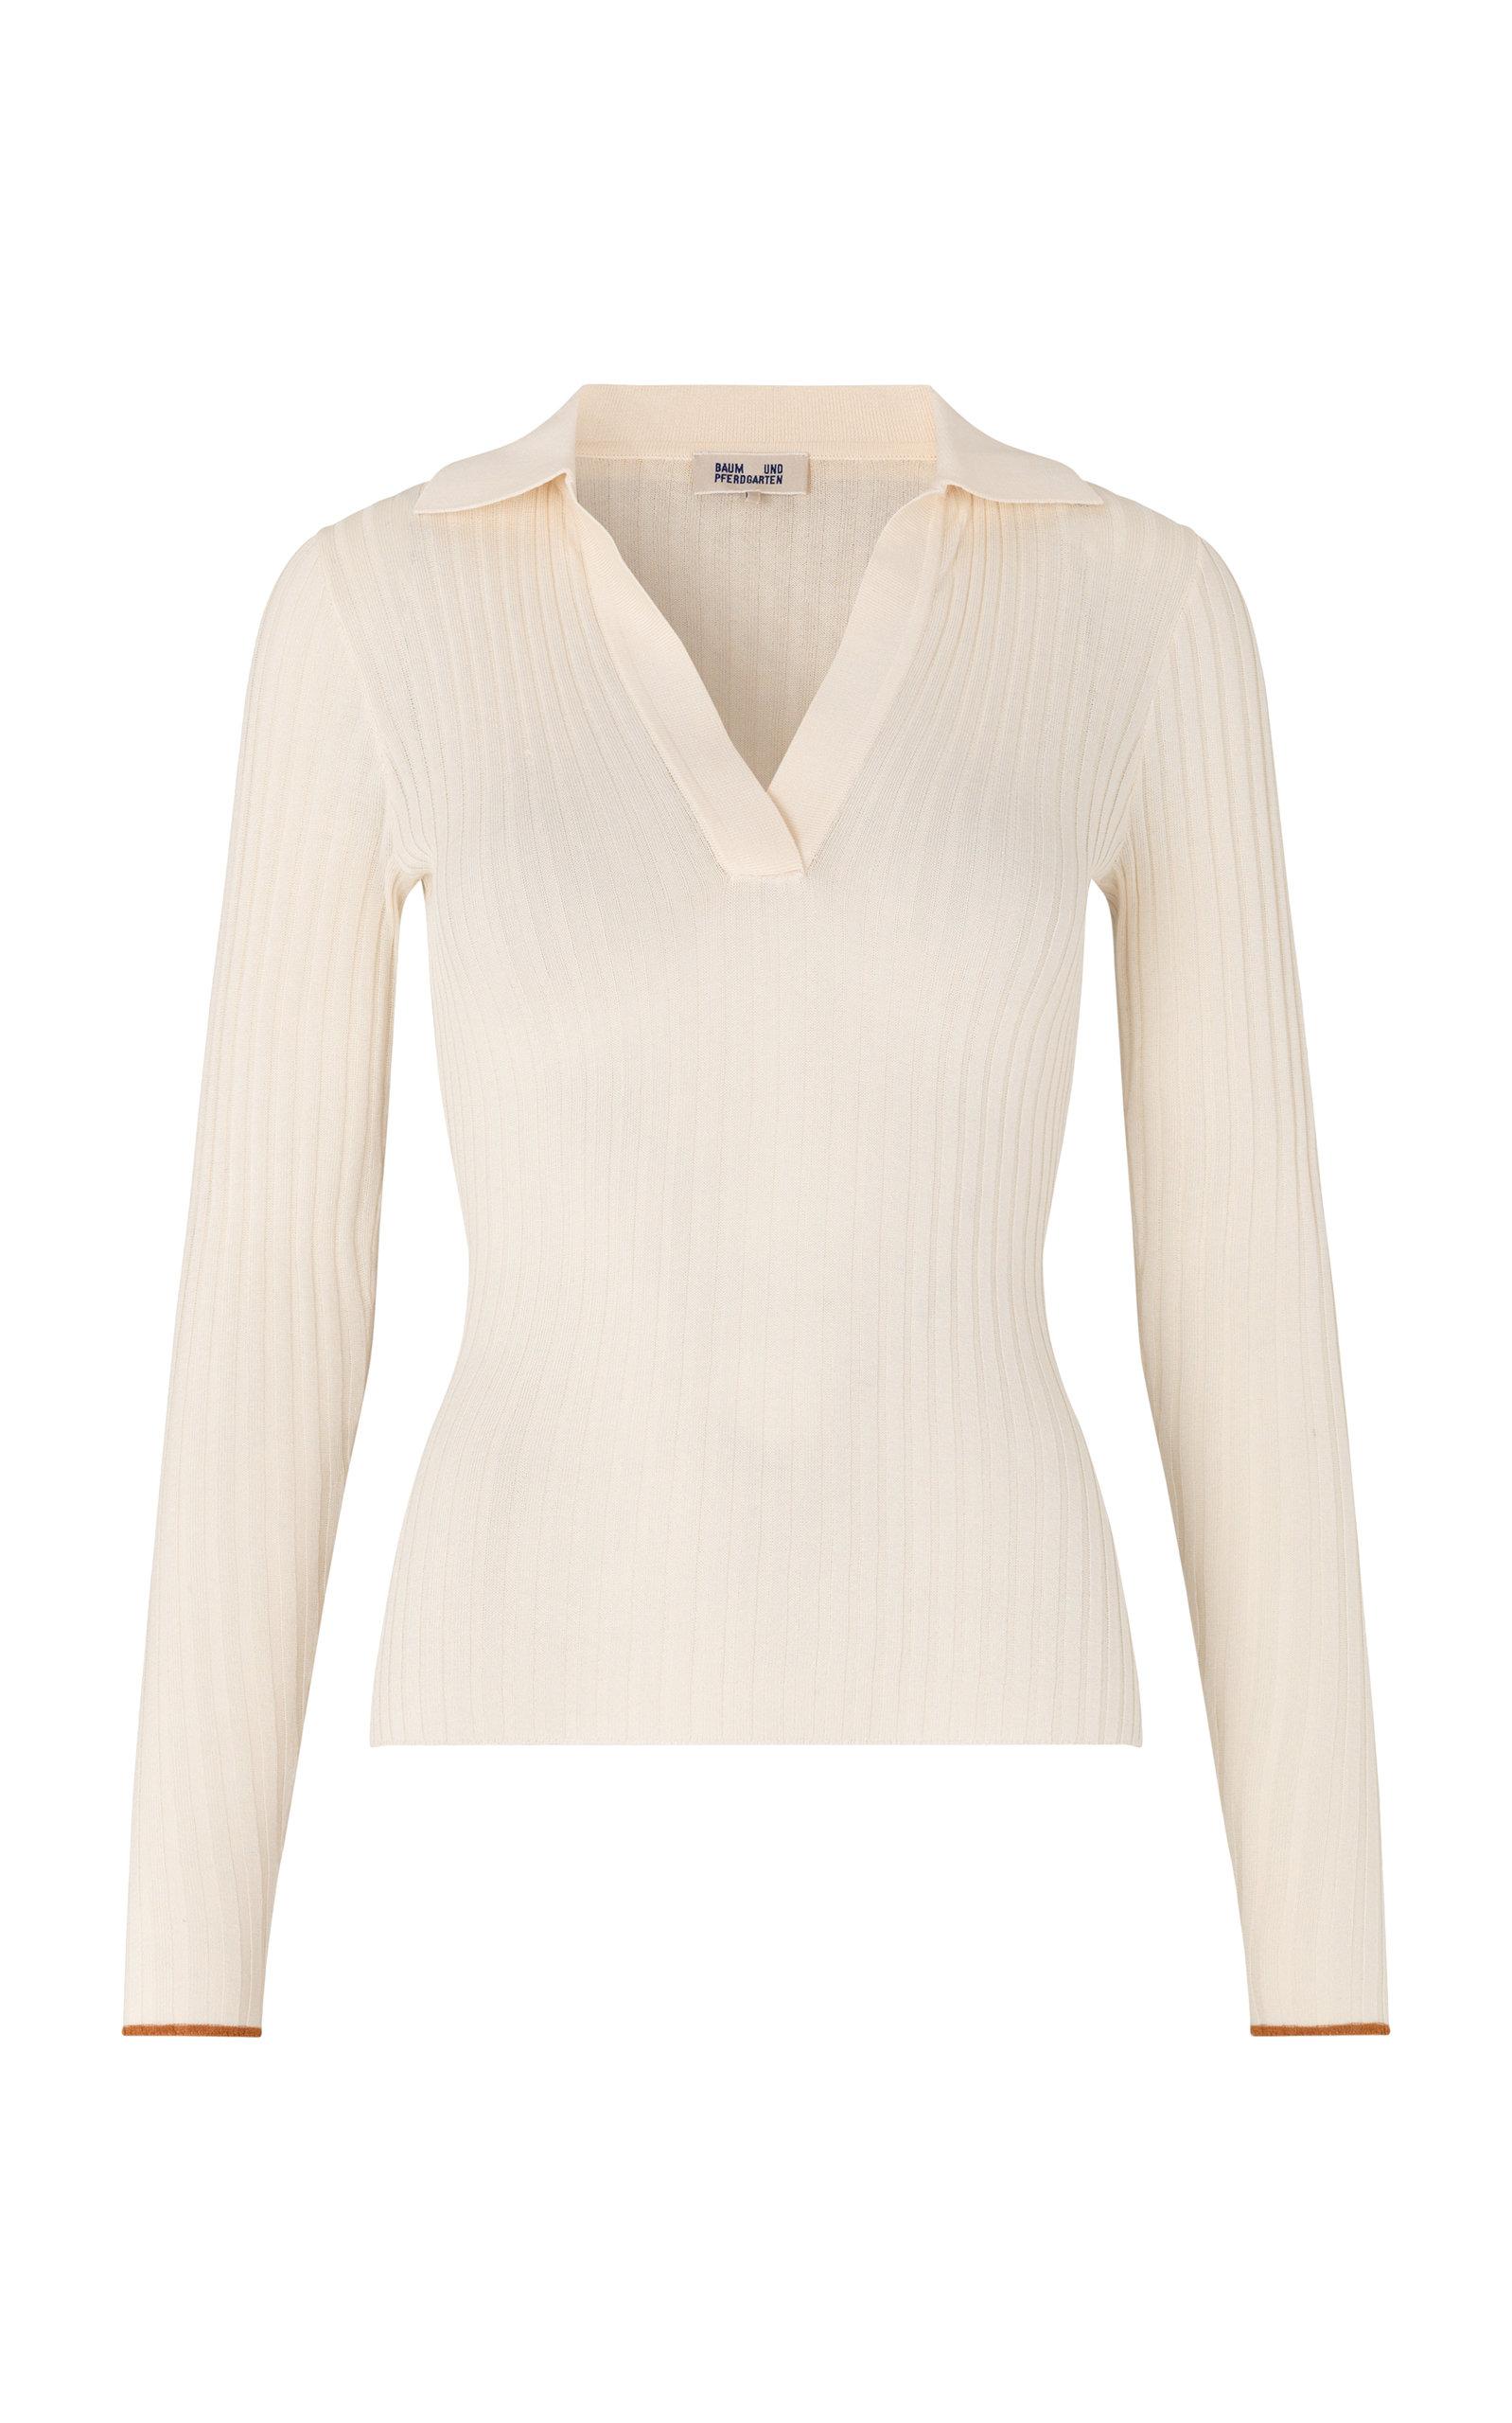 Baum Und Pferdgarten Sweaters WOMEN'S CEARA LONG SLEEVE KNIT TOP